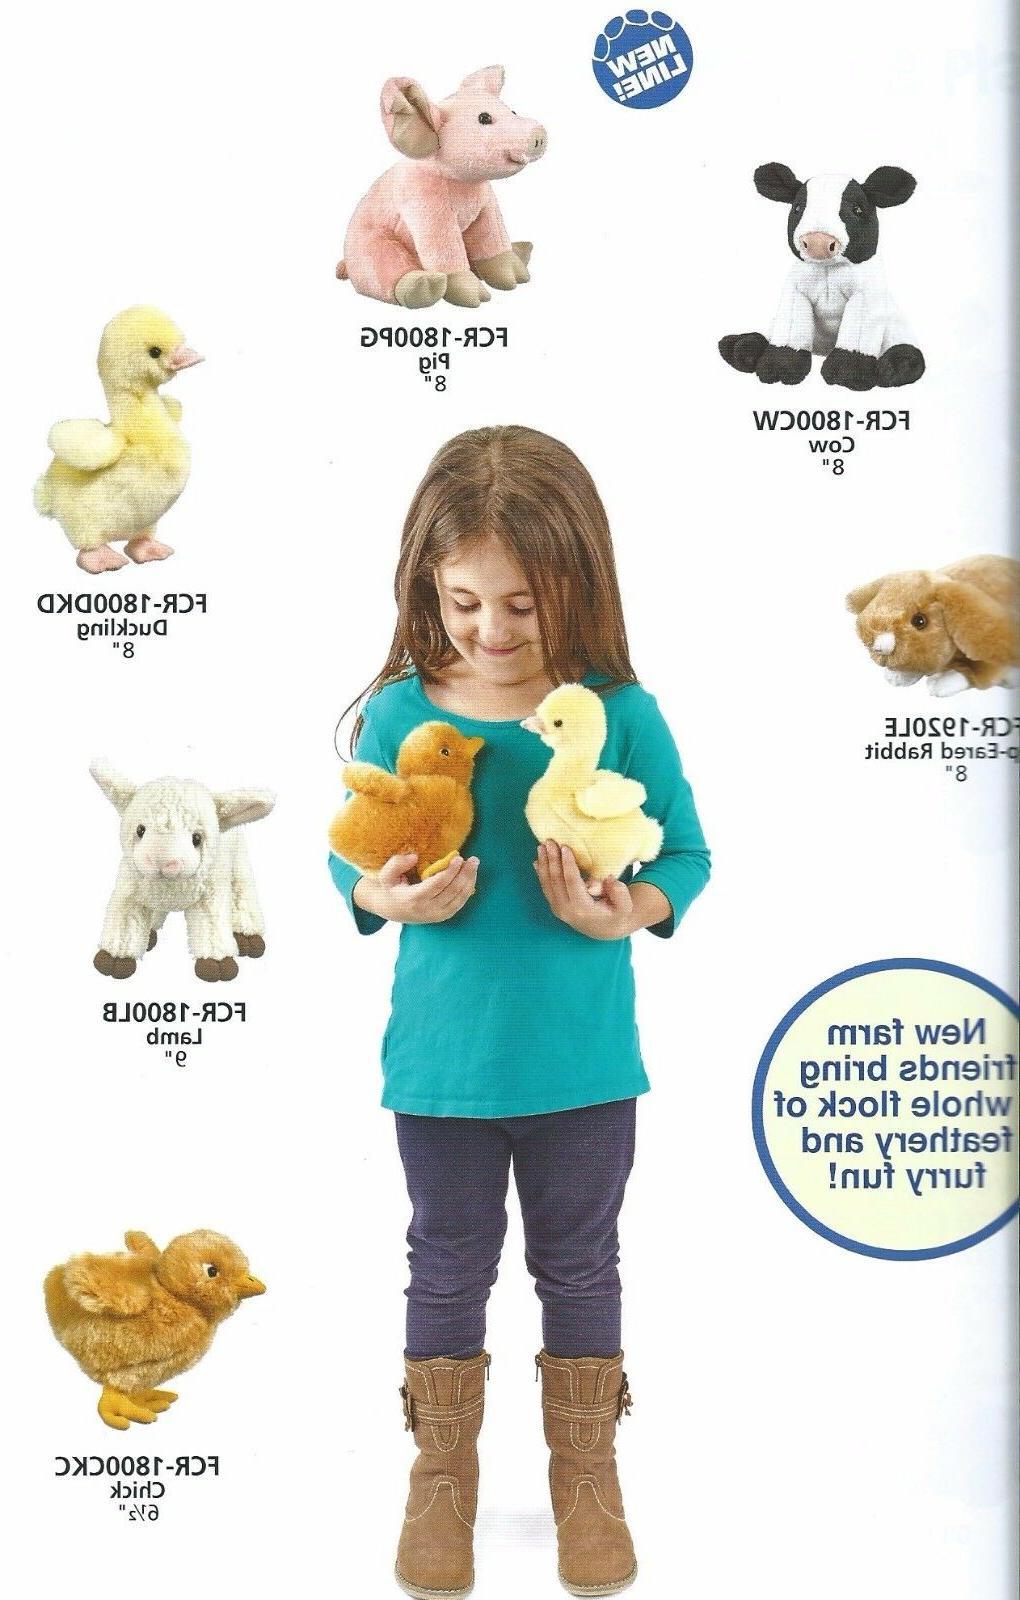 New Yellow Chick Toy Stuffed Artists